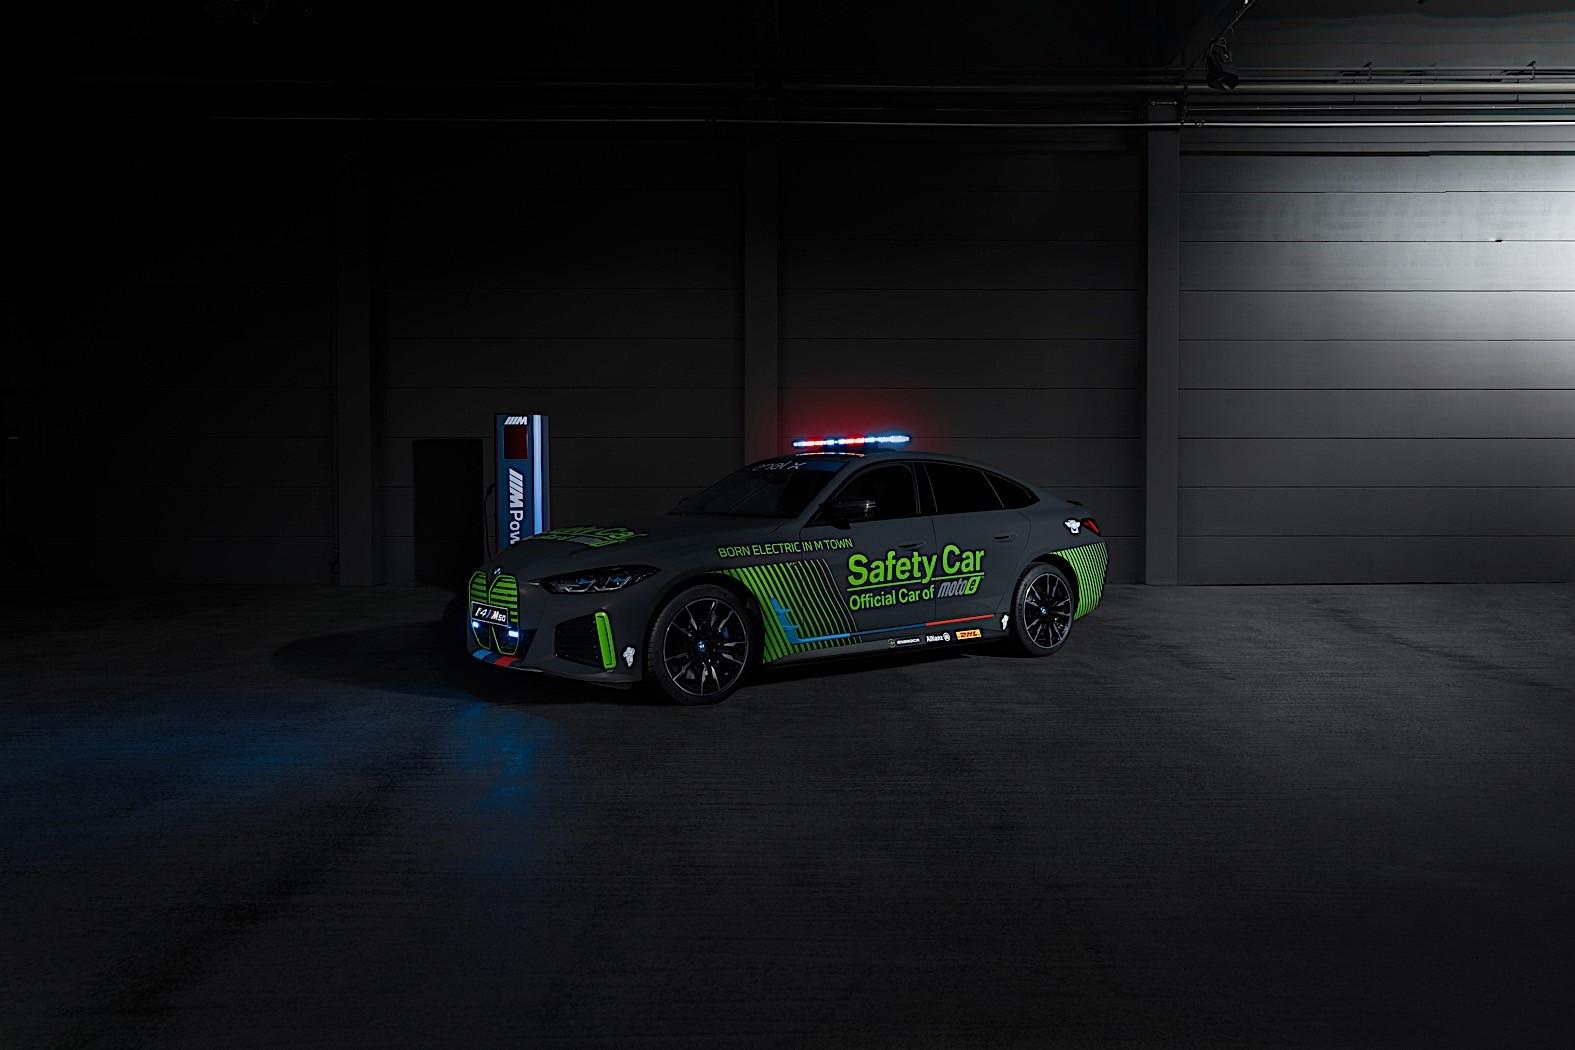 MOTOE'NİN GÜVENLİK ARACI BMW i4 M50 OLDU